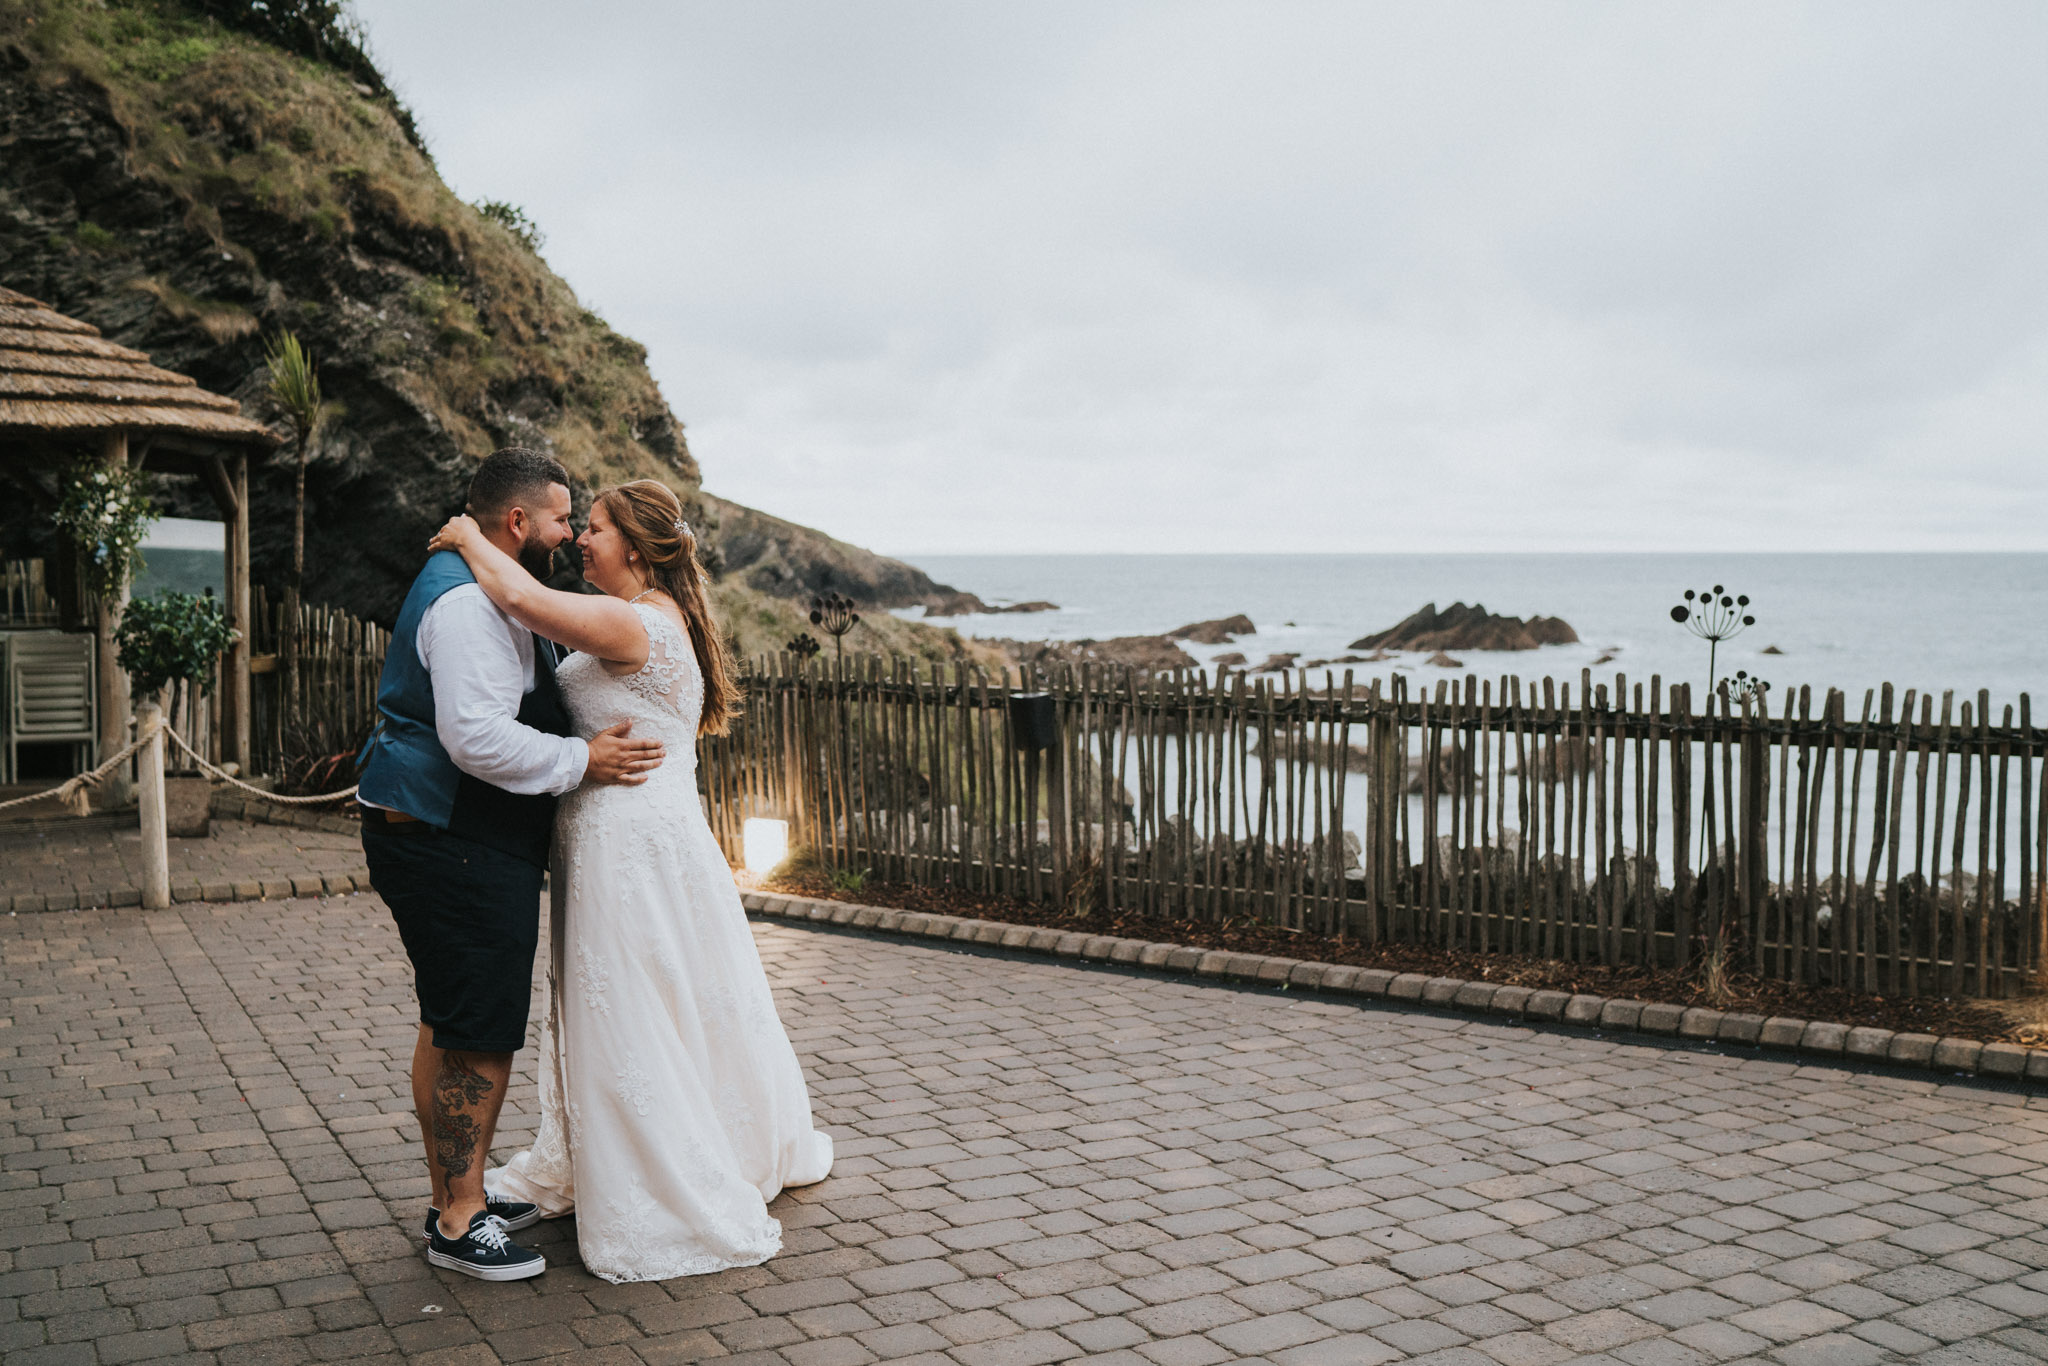 John-Amy-Tunnels-Beaches-Ilfracombe-Devon-Outdoor-Wedding-UK-Colchester-Essex-Alternative-Wedding-Photographer-Grace-Elizabeth (31 of 31).jpg